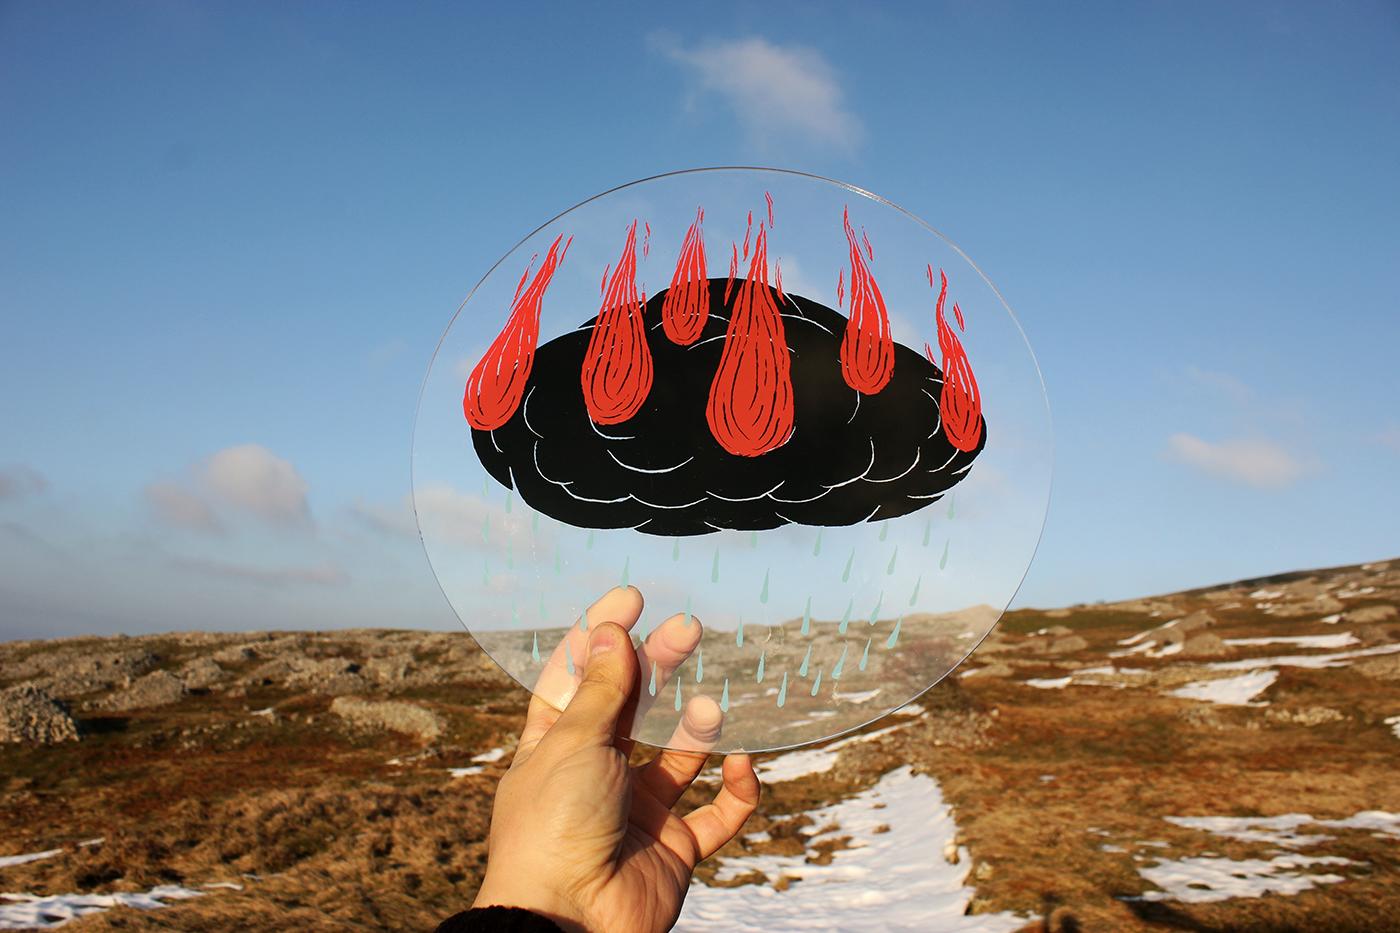 Andreco, Burning Cloud, Changing Climate, 2015, stampa serigrafica su plaxiglass, courtesy dell'artista